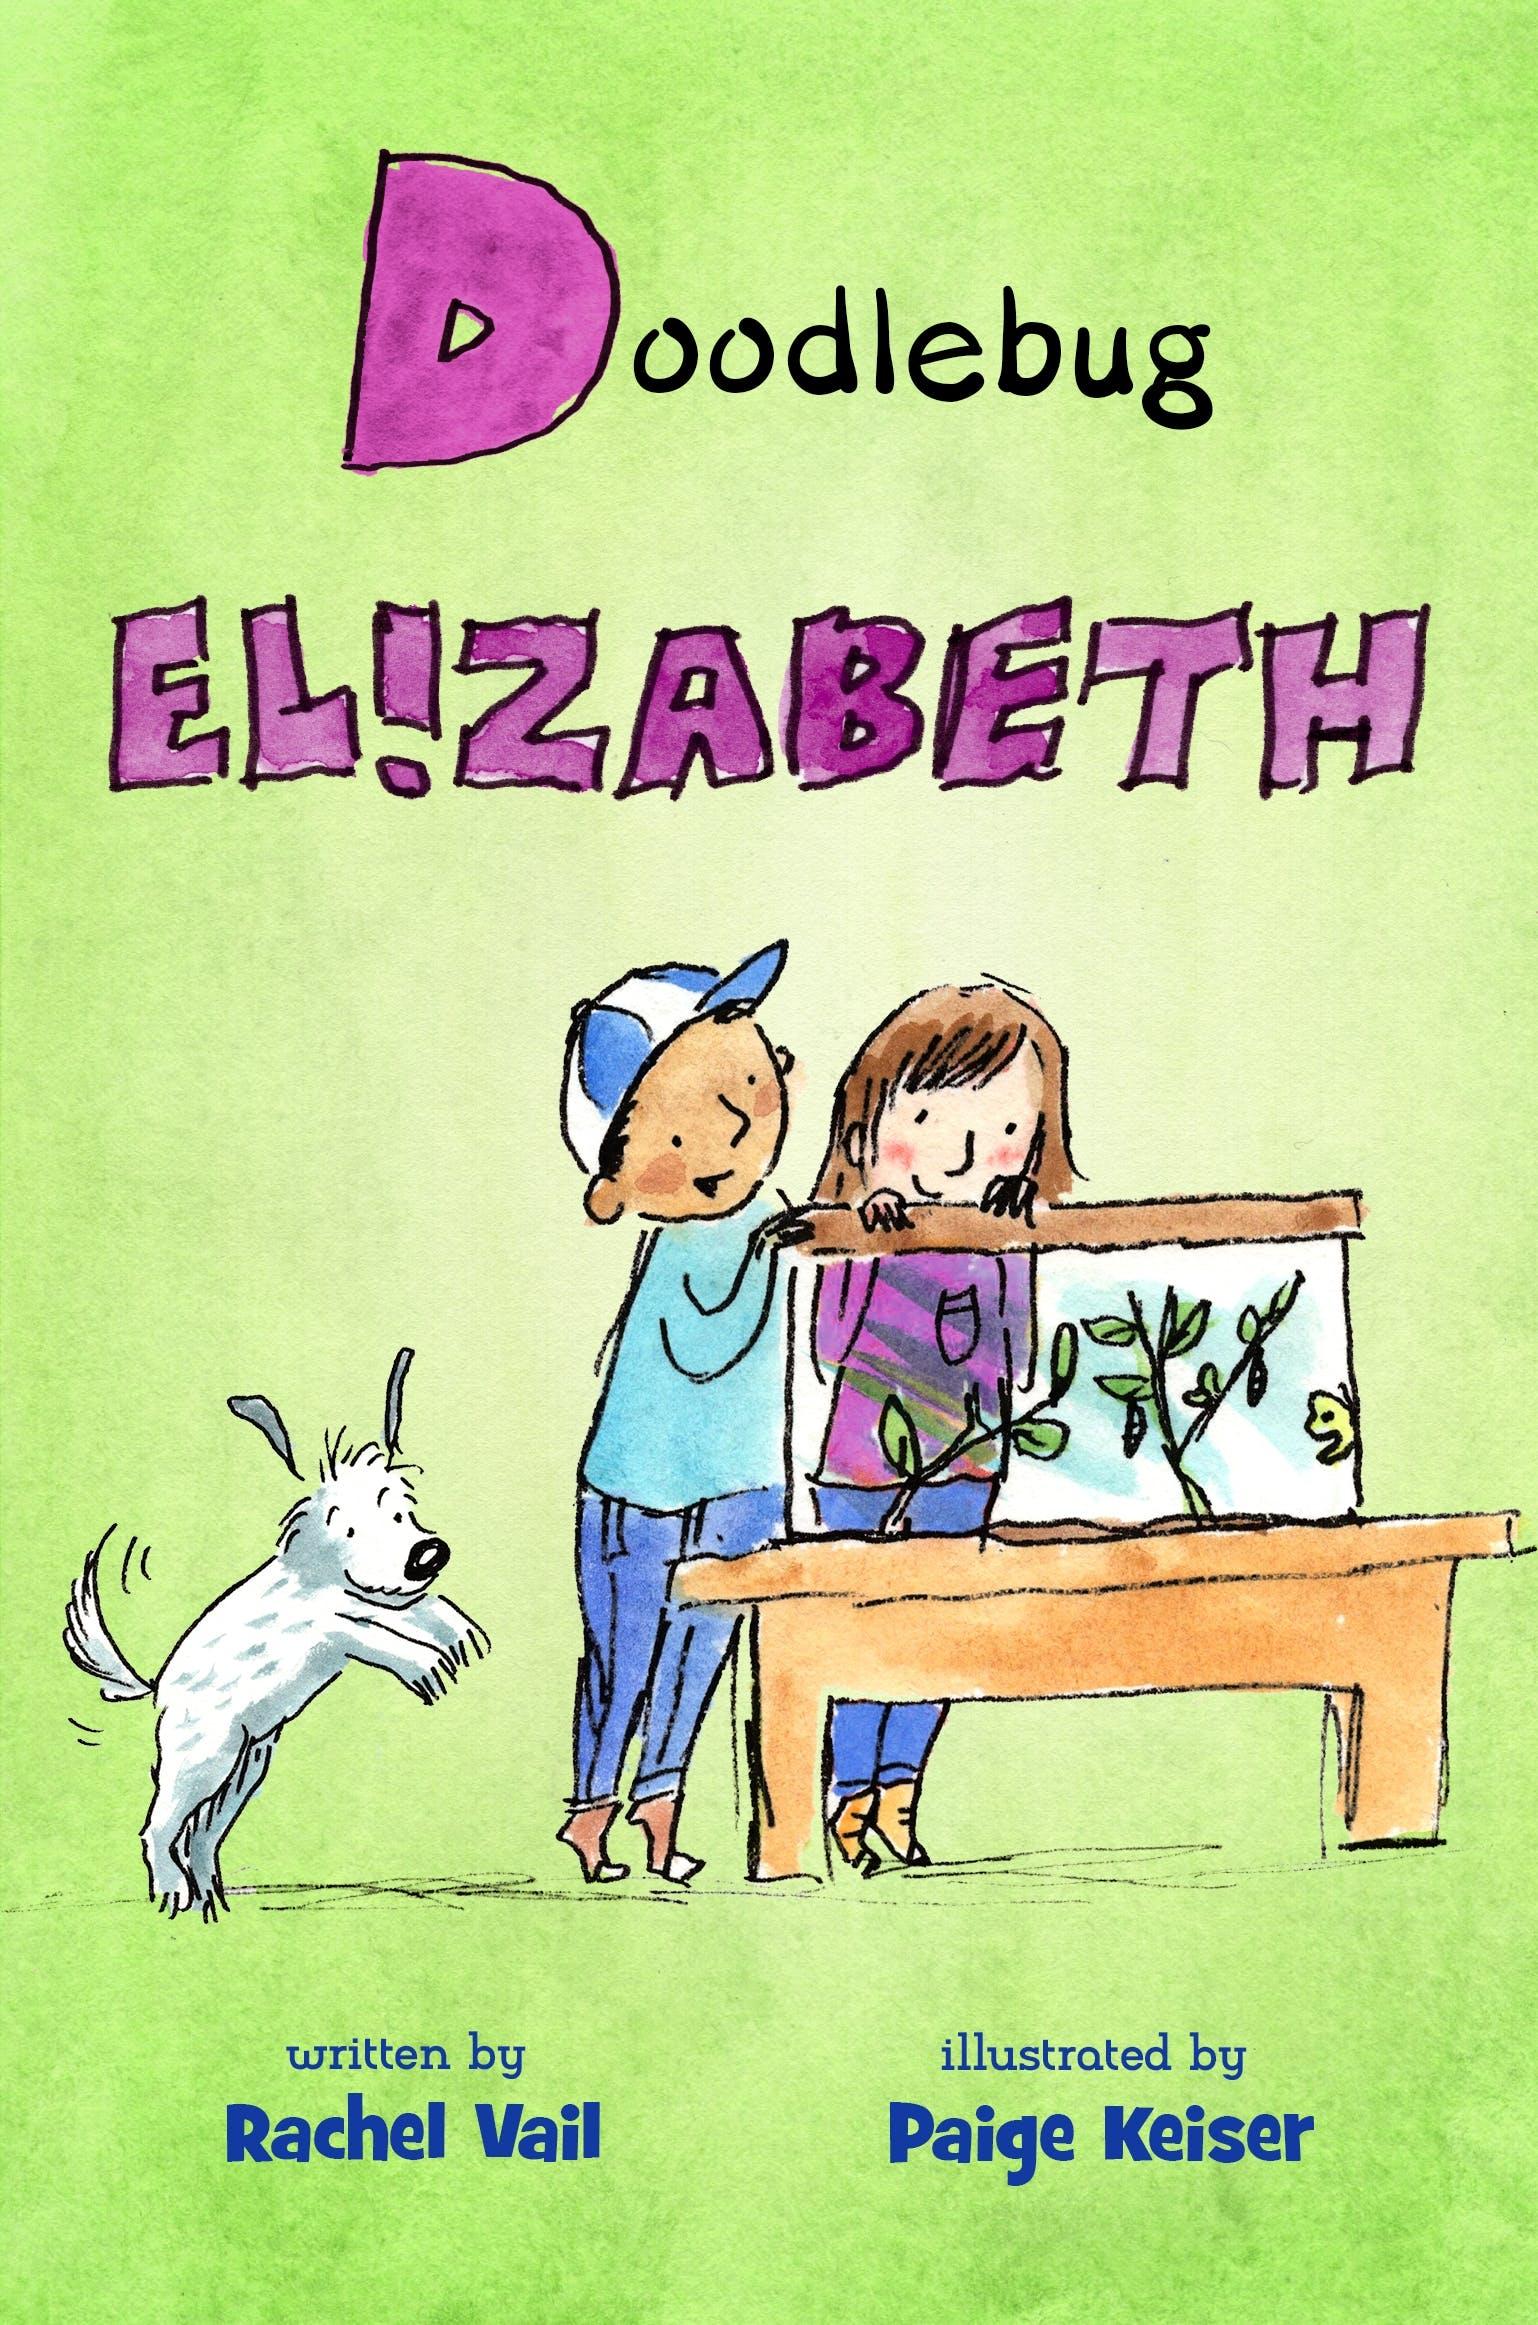 Image of Doodlebug Elizabeth